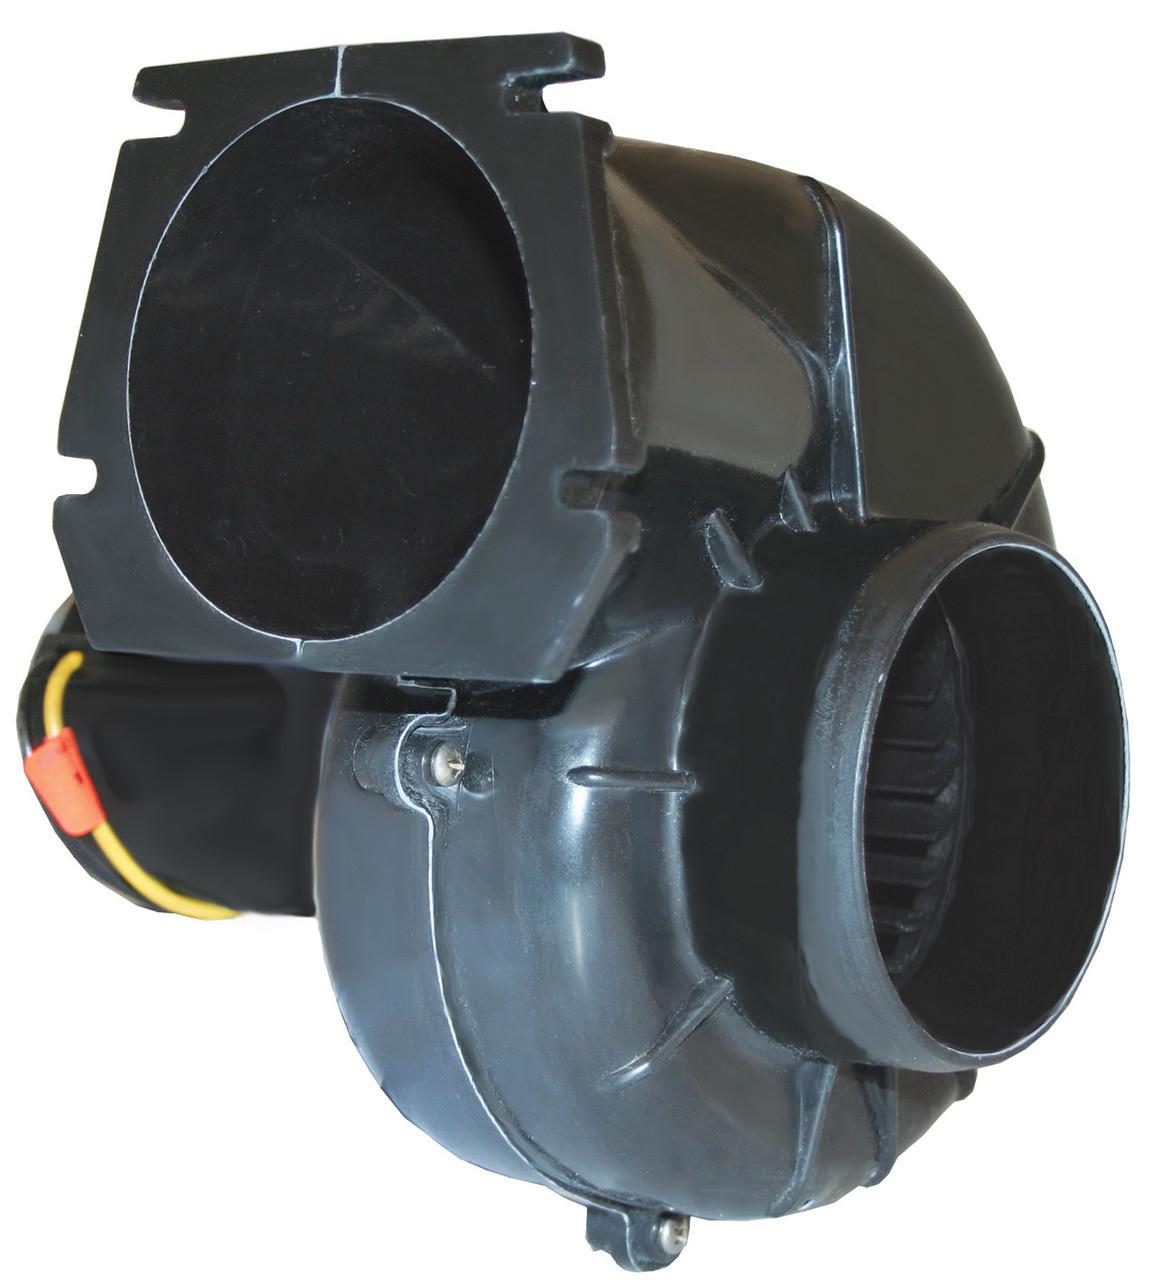 Jabsco Extra Heavy Duty Blower - Flange Mount 12v